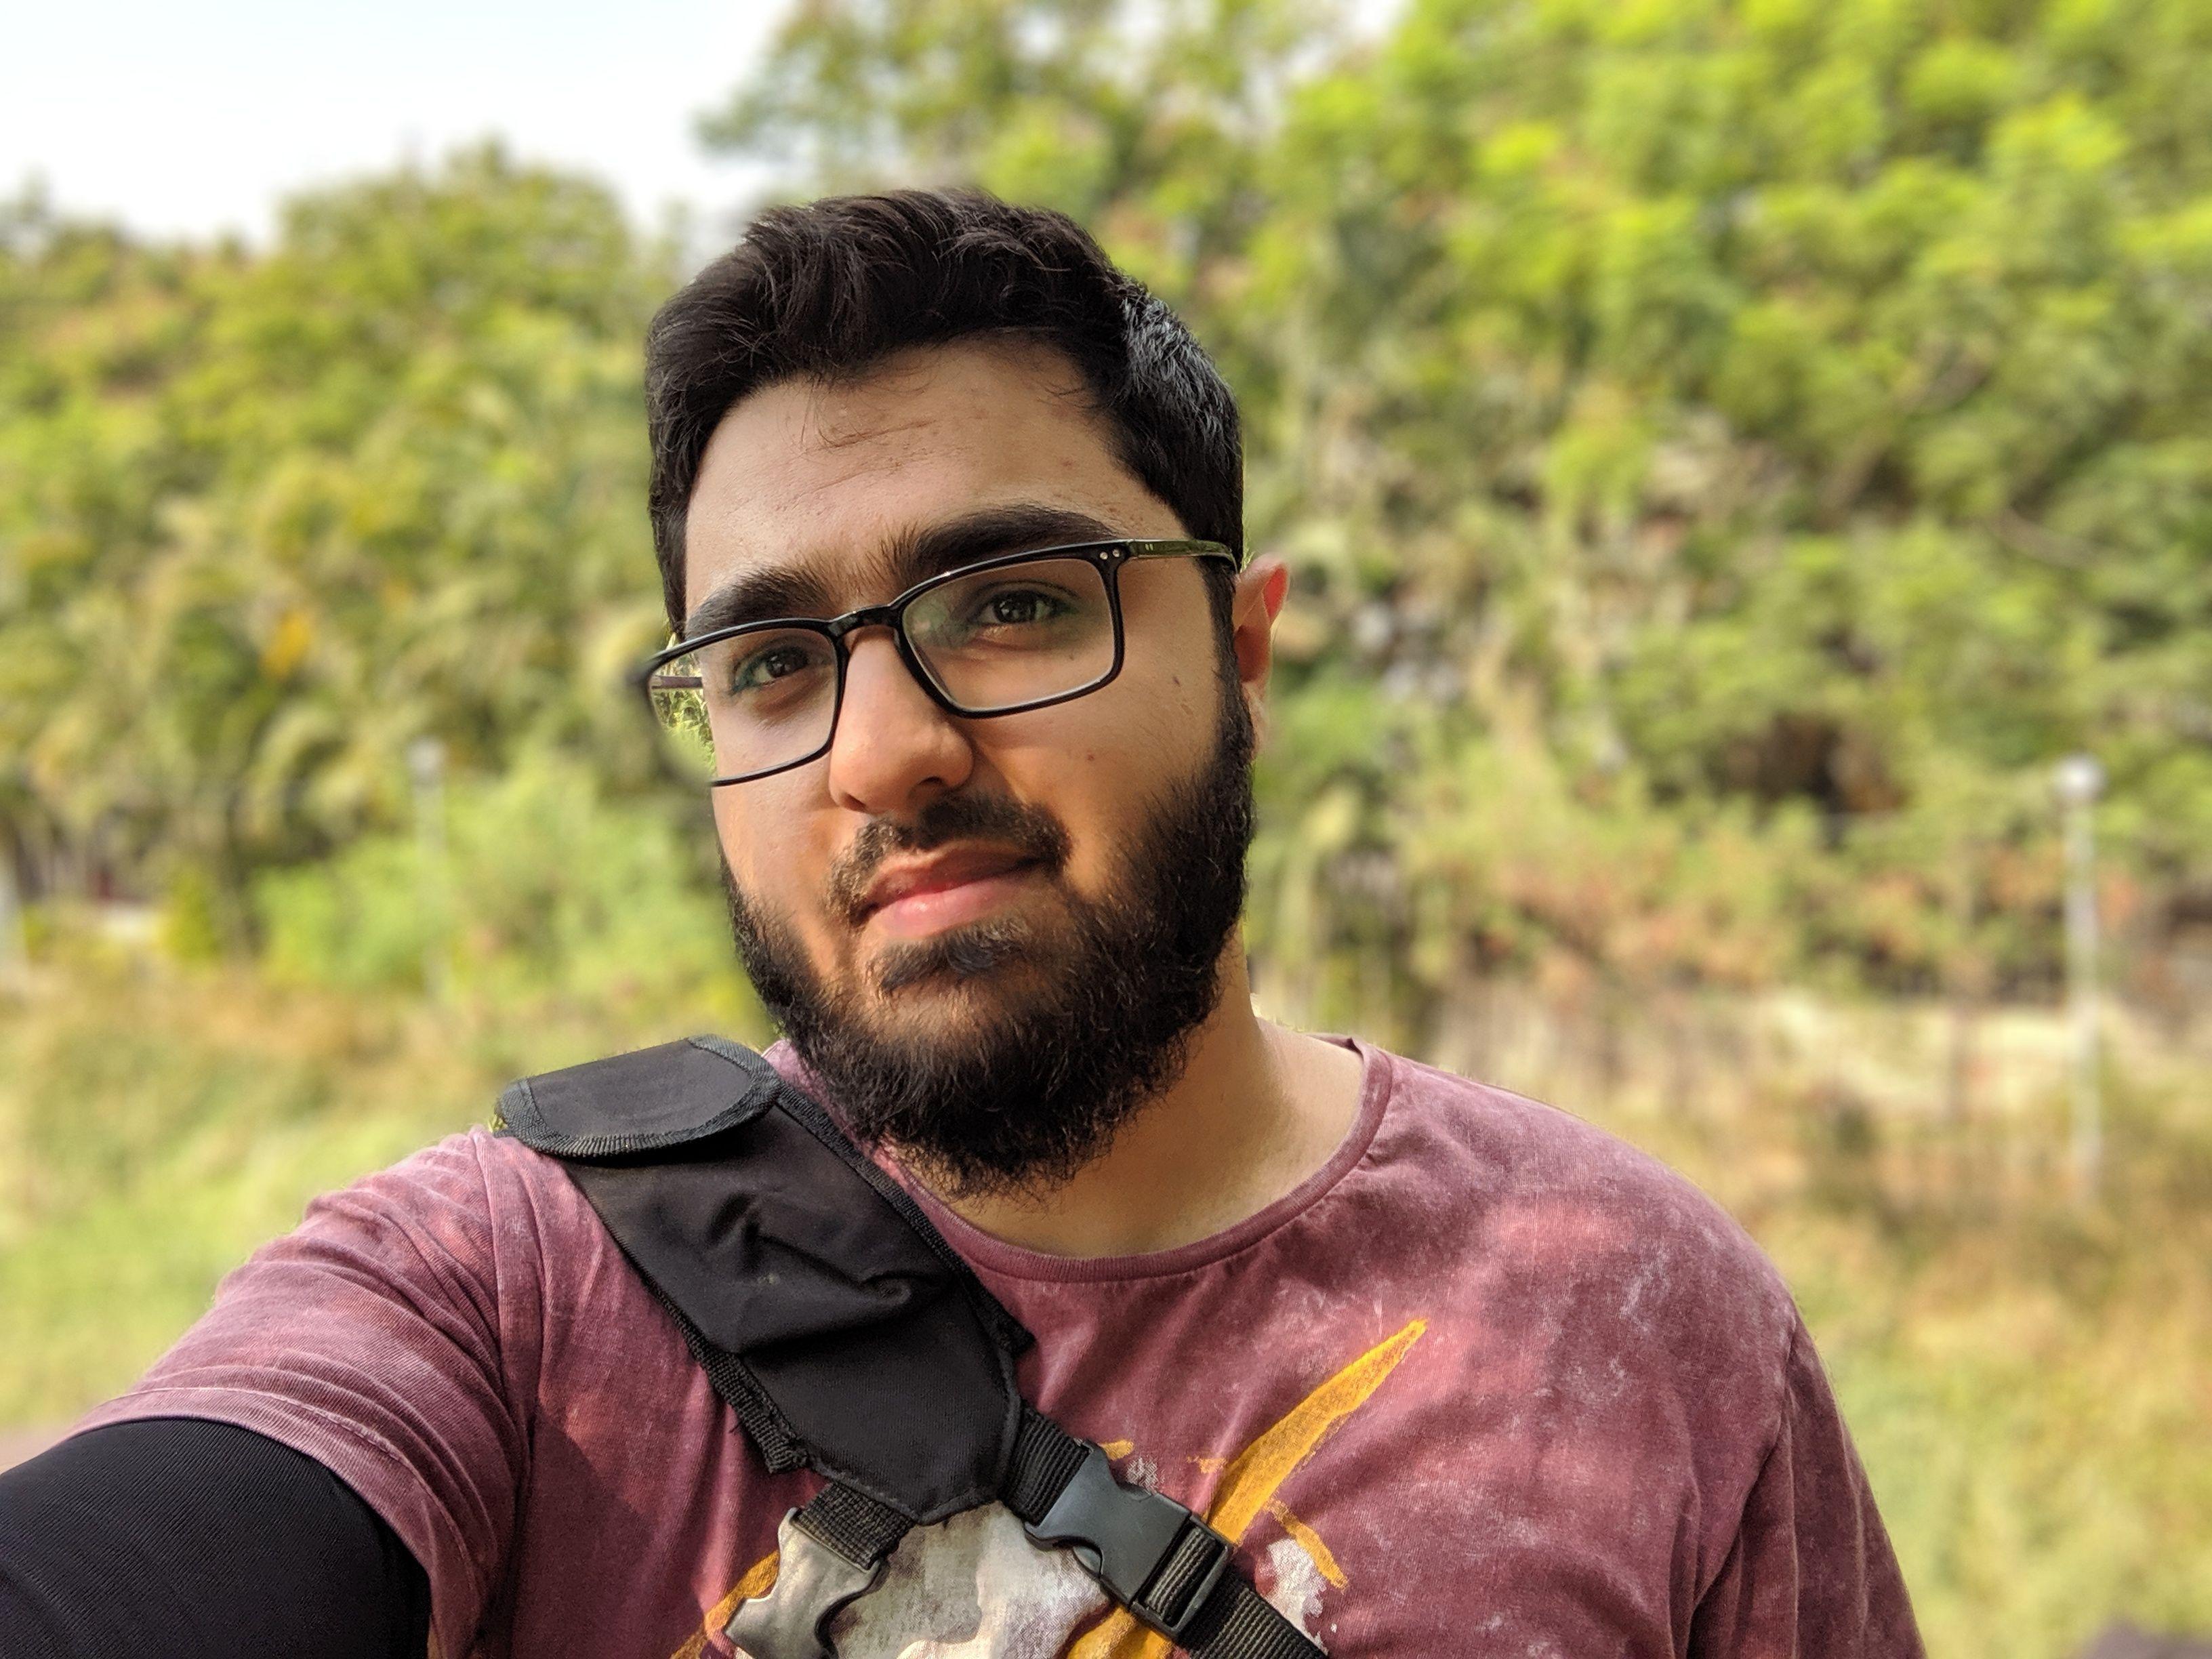 Google Pixel 3a Camera Sample